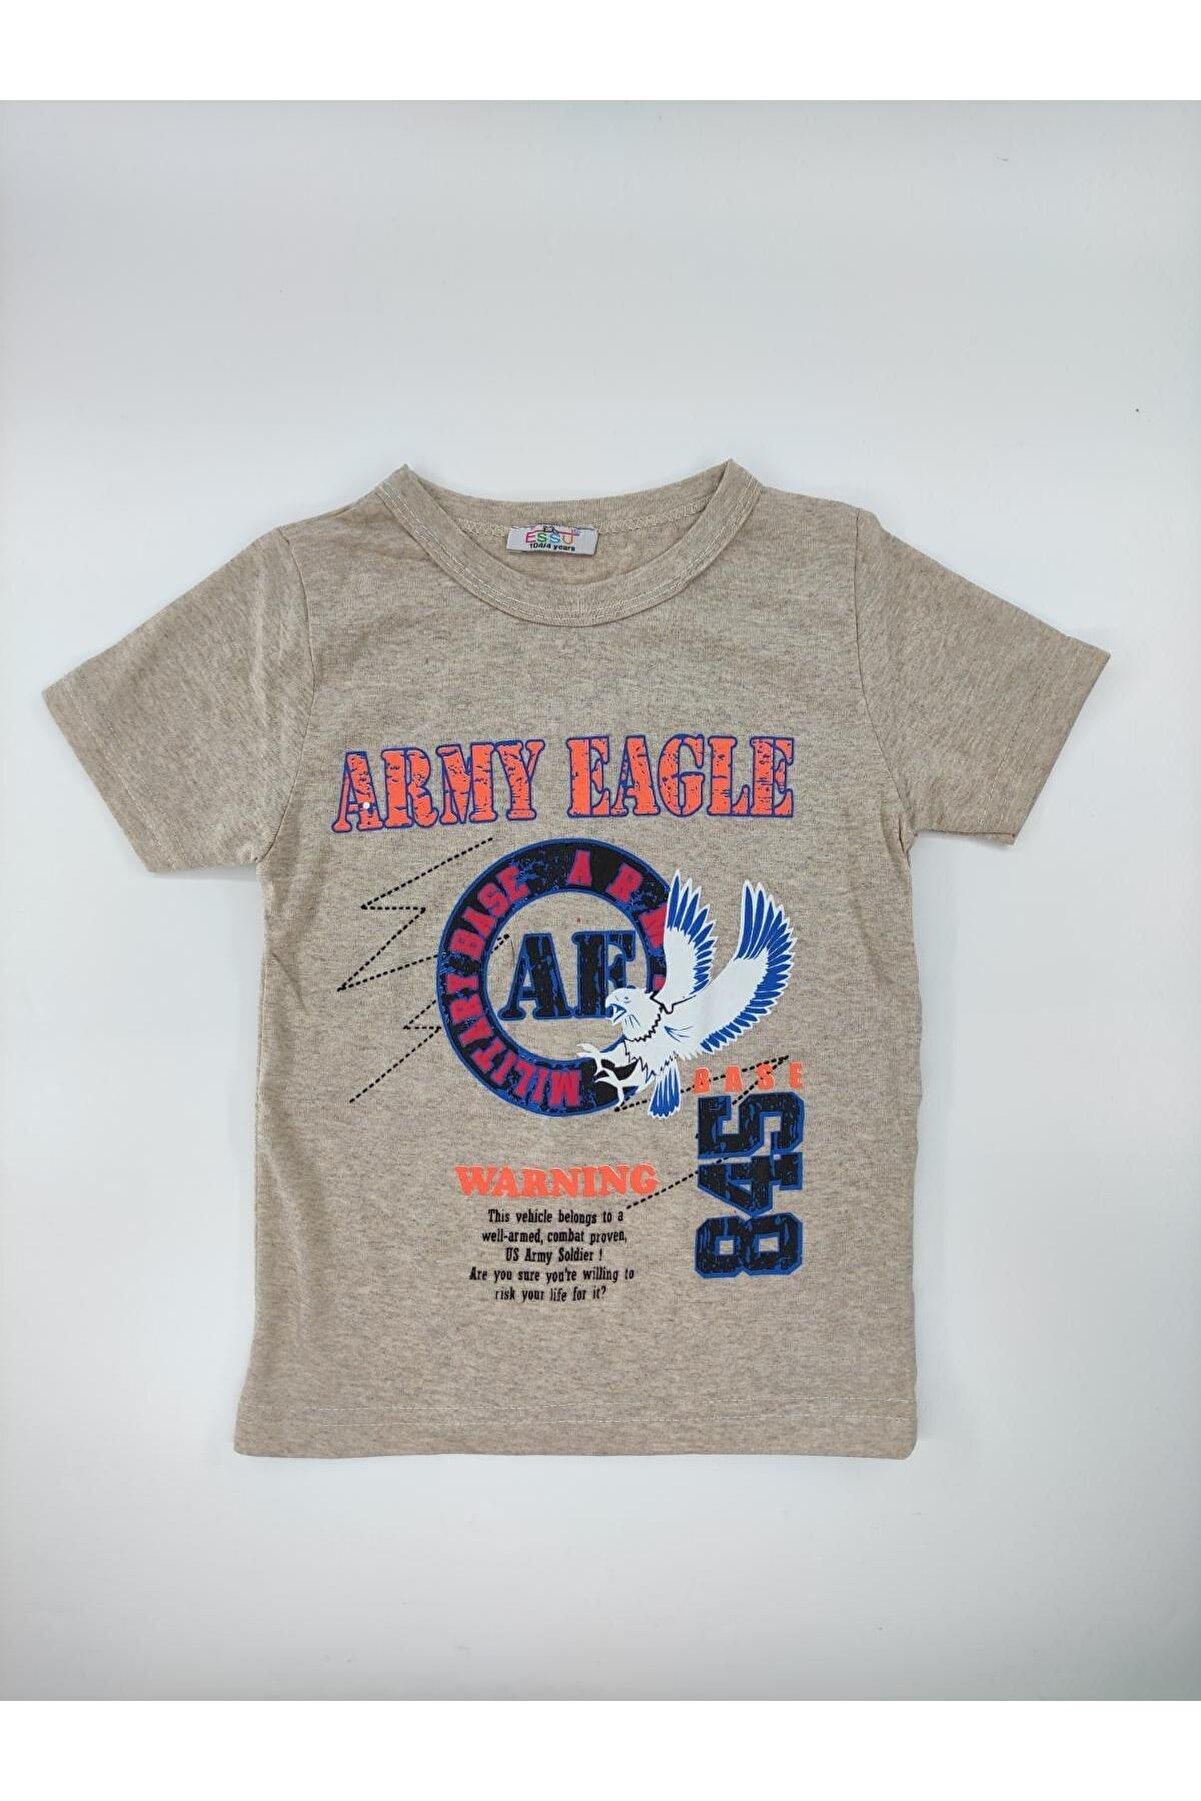 giyinsen 1552786 Essu 220915 Army Eagle 845 Baskılı Tshirt 2/10 Yaş